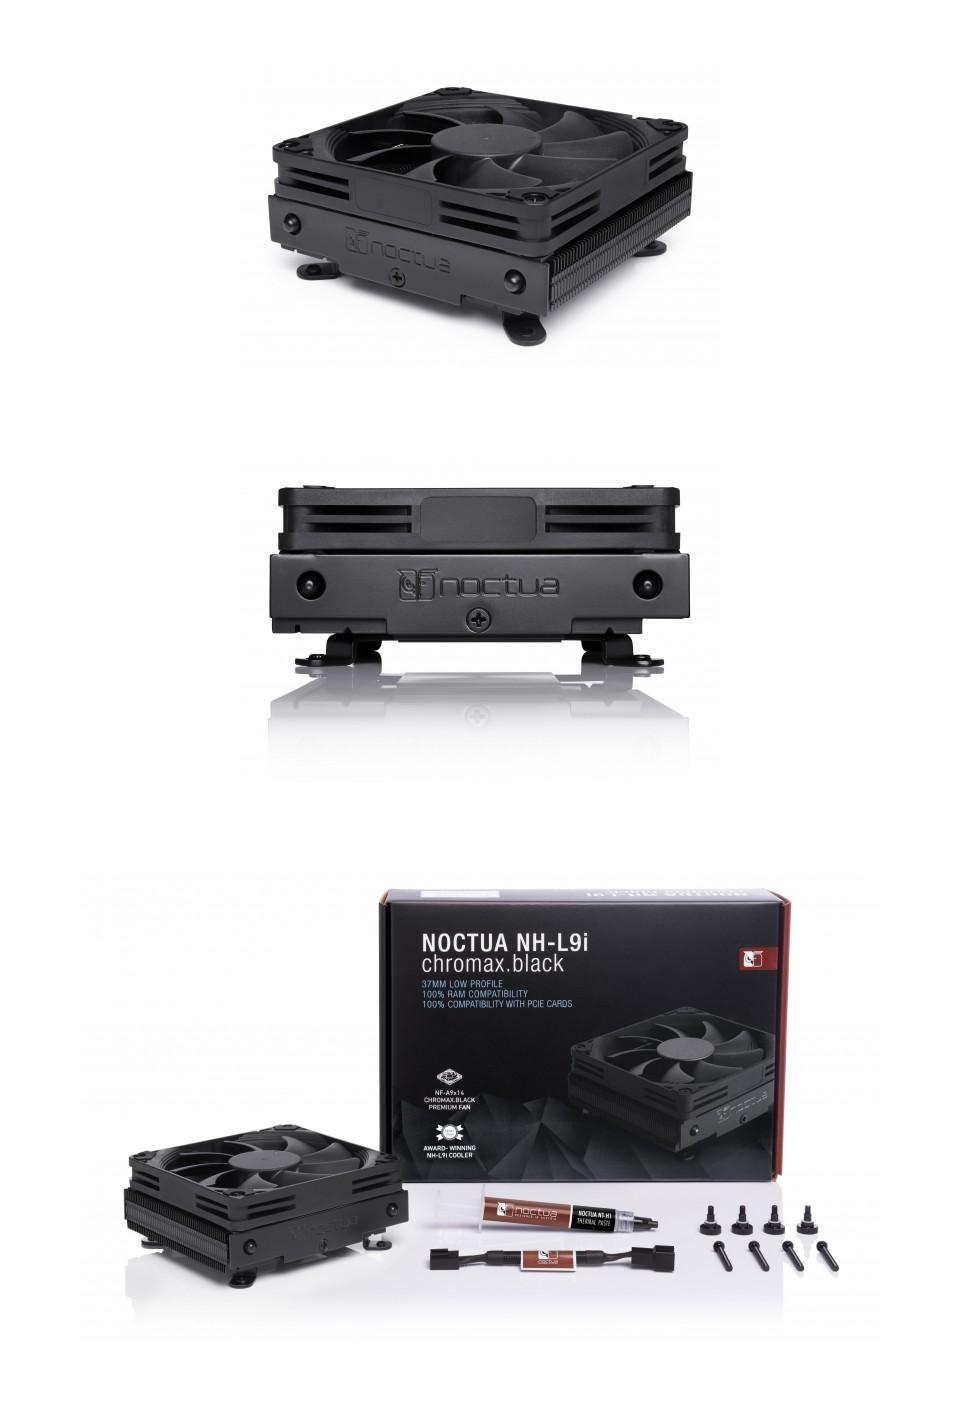 Noctua NH-L9i Low Profile Chromax CPU Cooler Black product